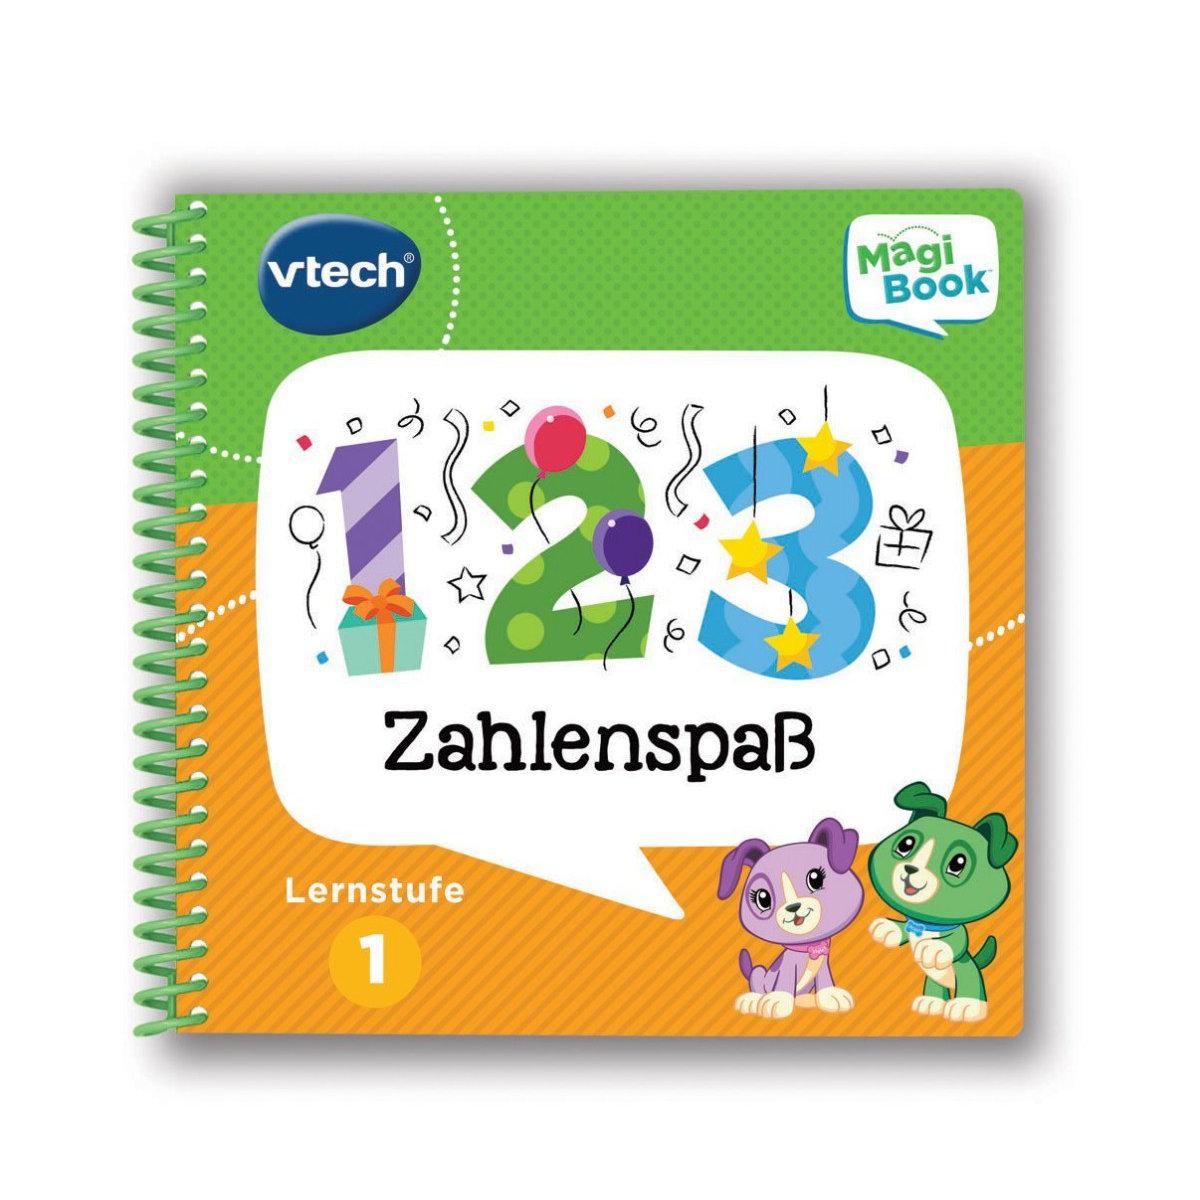 Kleinkindspielzeug VTECH MAGIBOOK MAGI BOOK BLAU GRÜN INTERAKTIVES LERNBUCH 602104 NEU